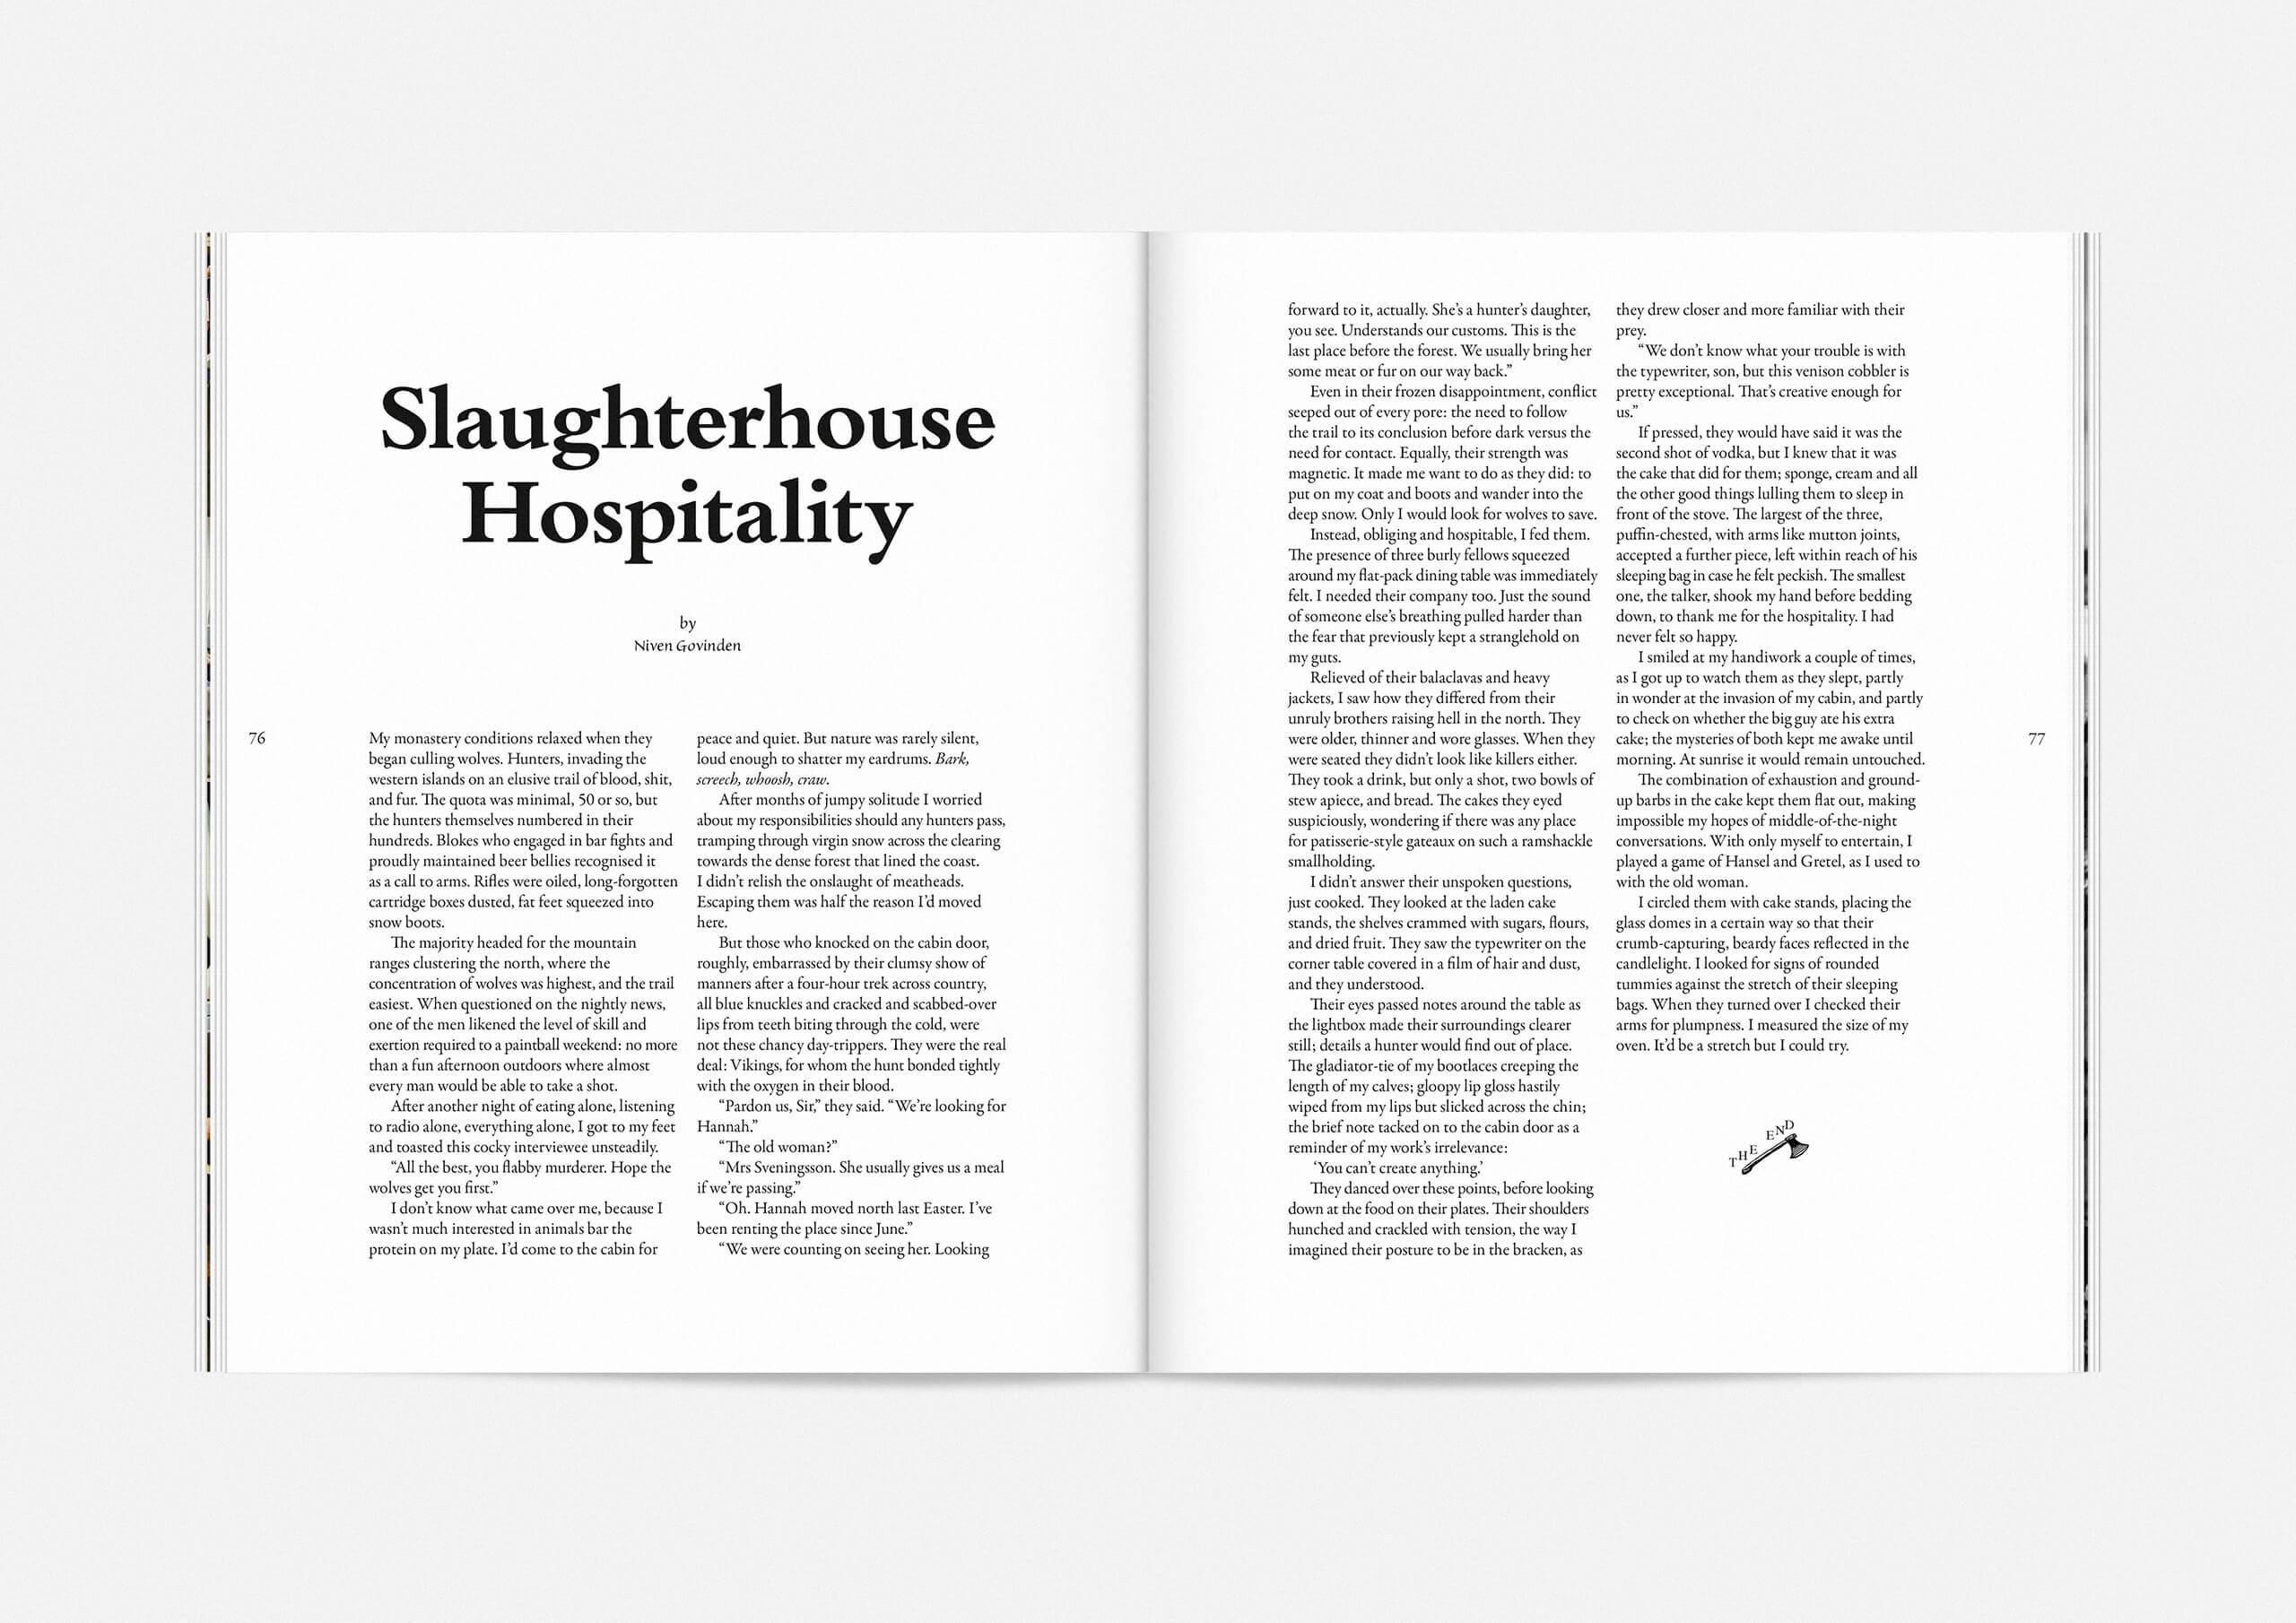 https://neuegestaltung.de/media/pages/clients/teller-magazine-issue-2/f3d186a91e-1597415083/teller_issue_02_innenseite_76_77_ng.jpg